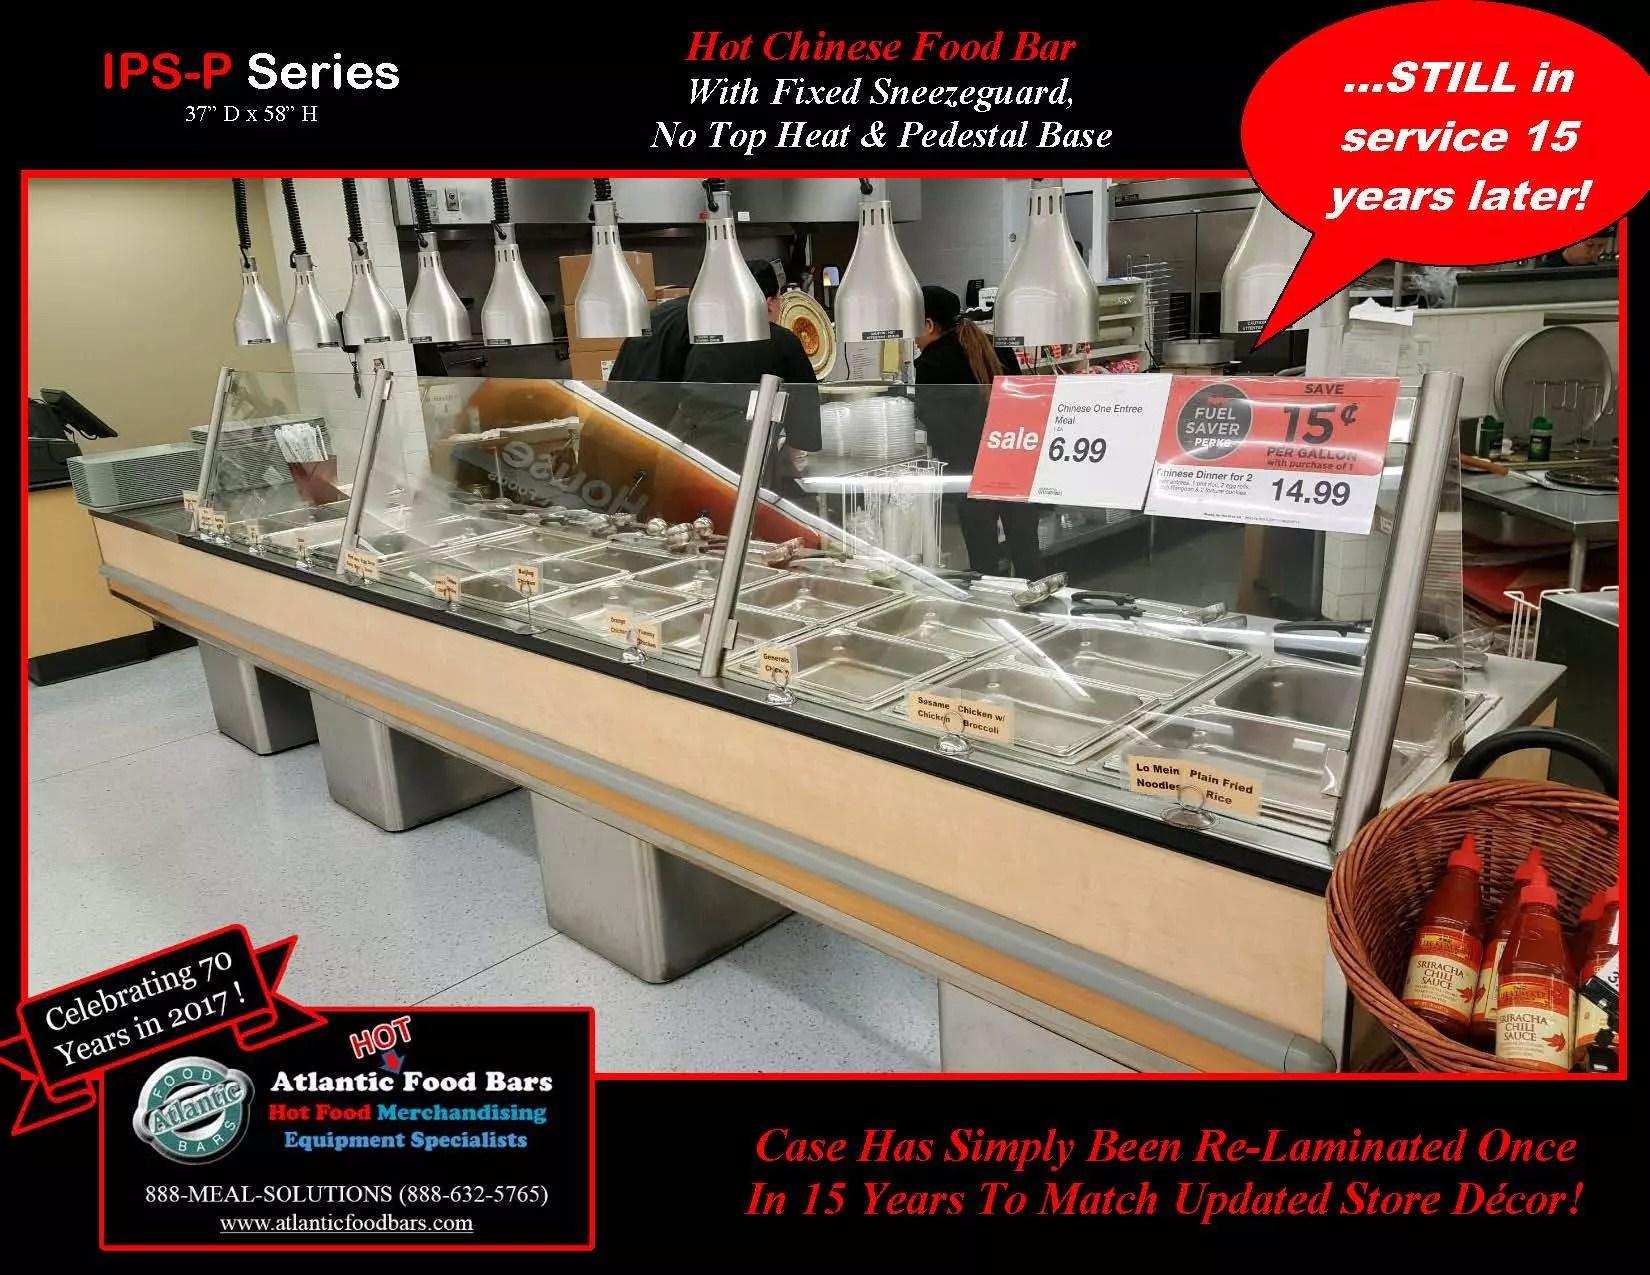 Atlantic Food Bars - Hot Chinese Food Bar with No Top Heat & Pedestal Base - IPS-P